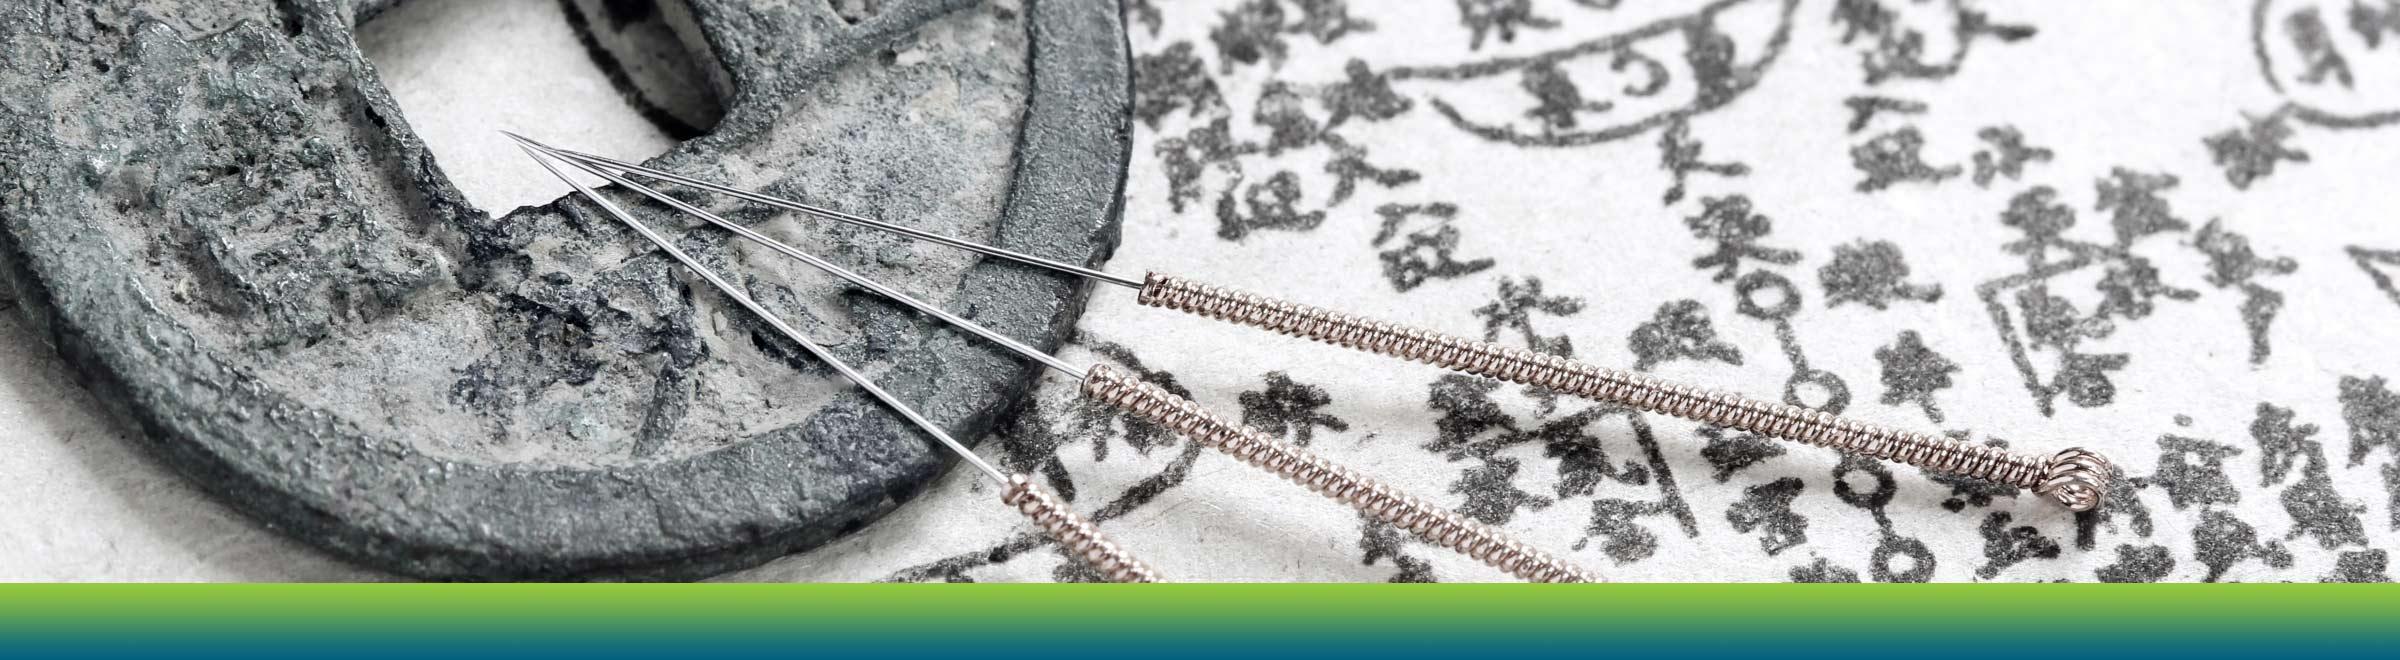 NCCAOM Acupuncture needle hero image.